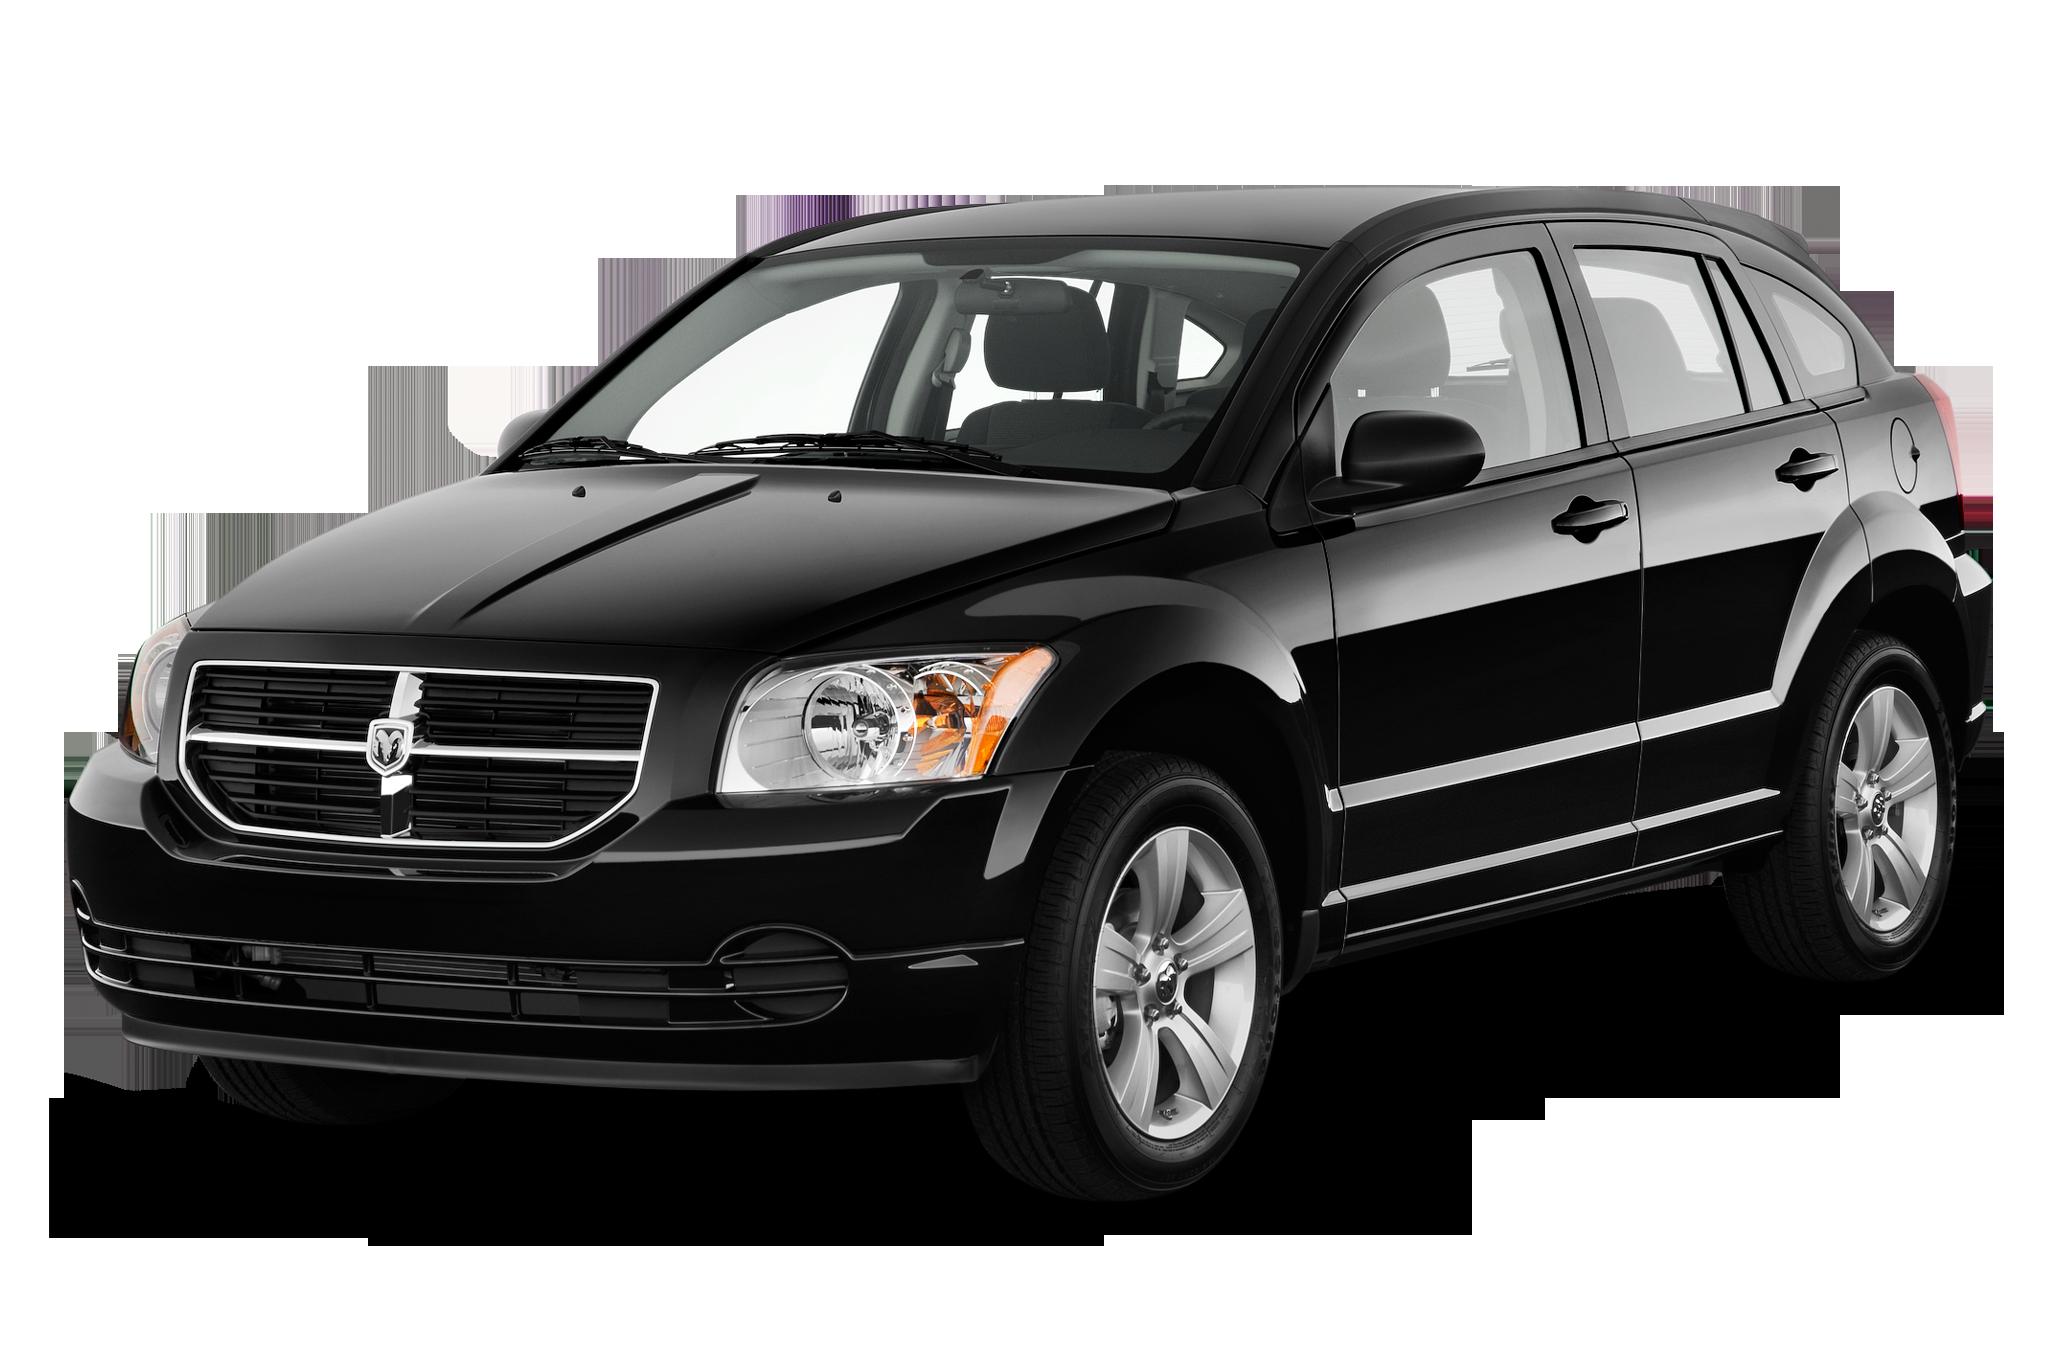 Dodge Caliber Mainstreet Wagon Angular Front on 2010 Dodge Caliber Rush